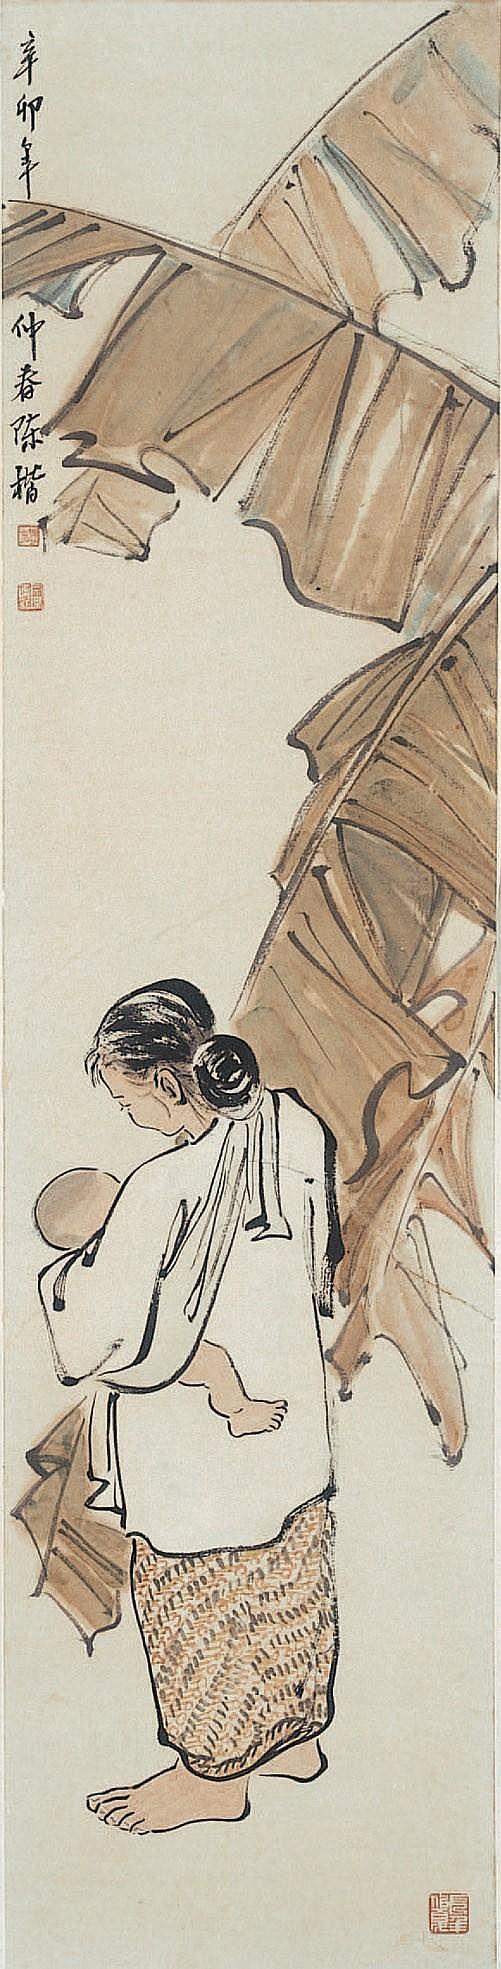 CHEN CHONG SWEE  (China 1910-Singapore 1986)